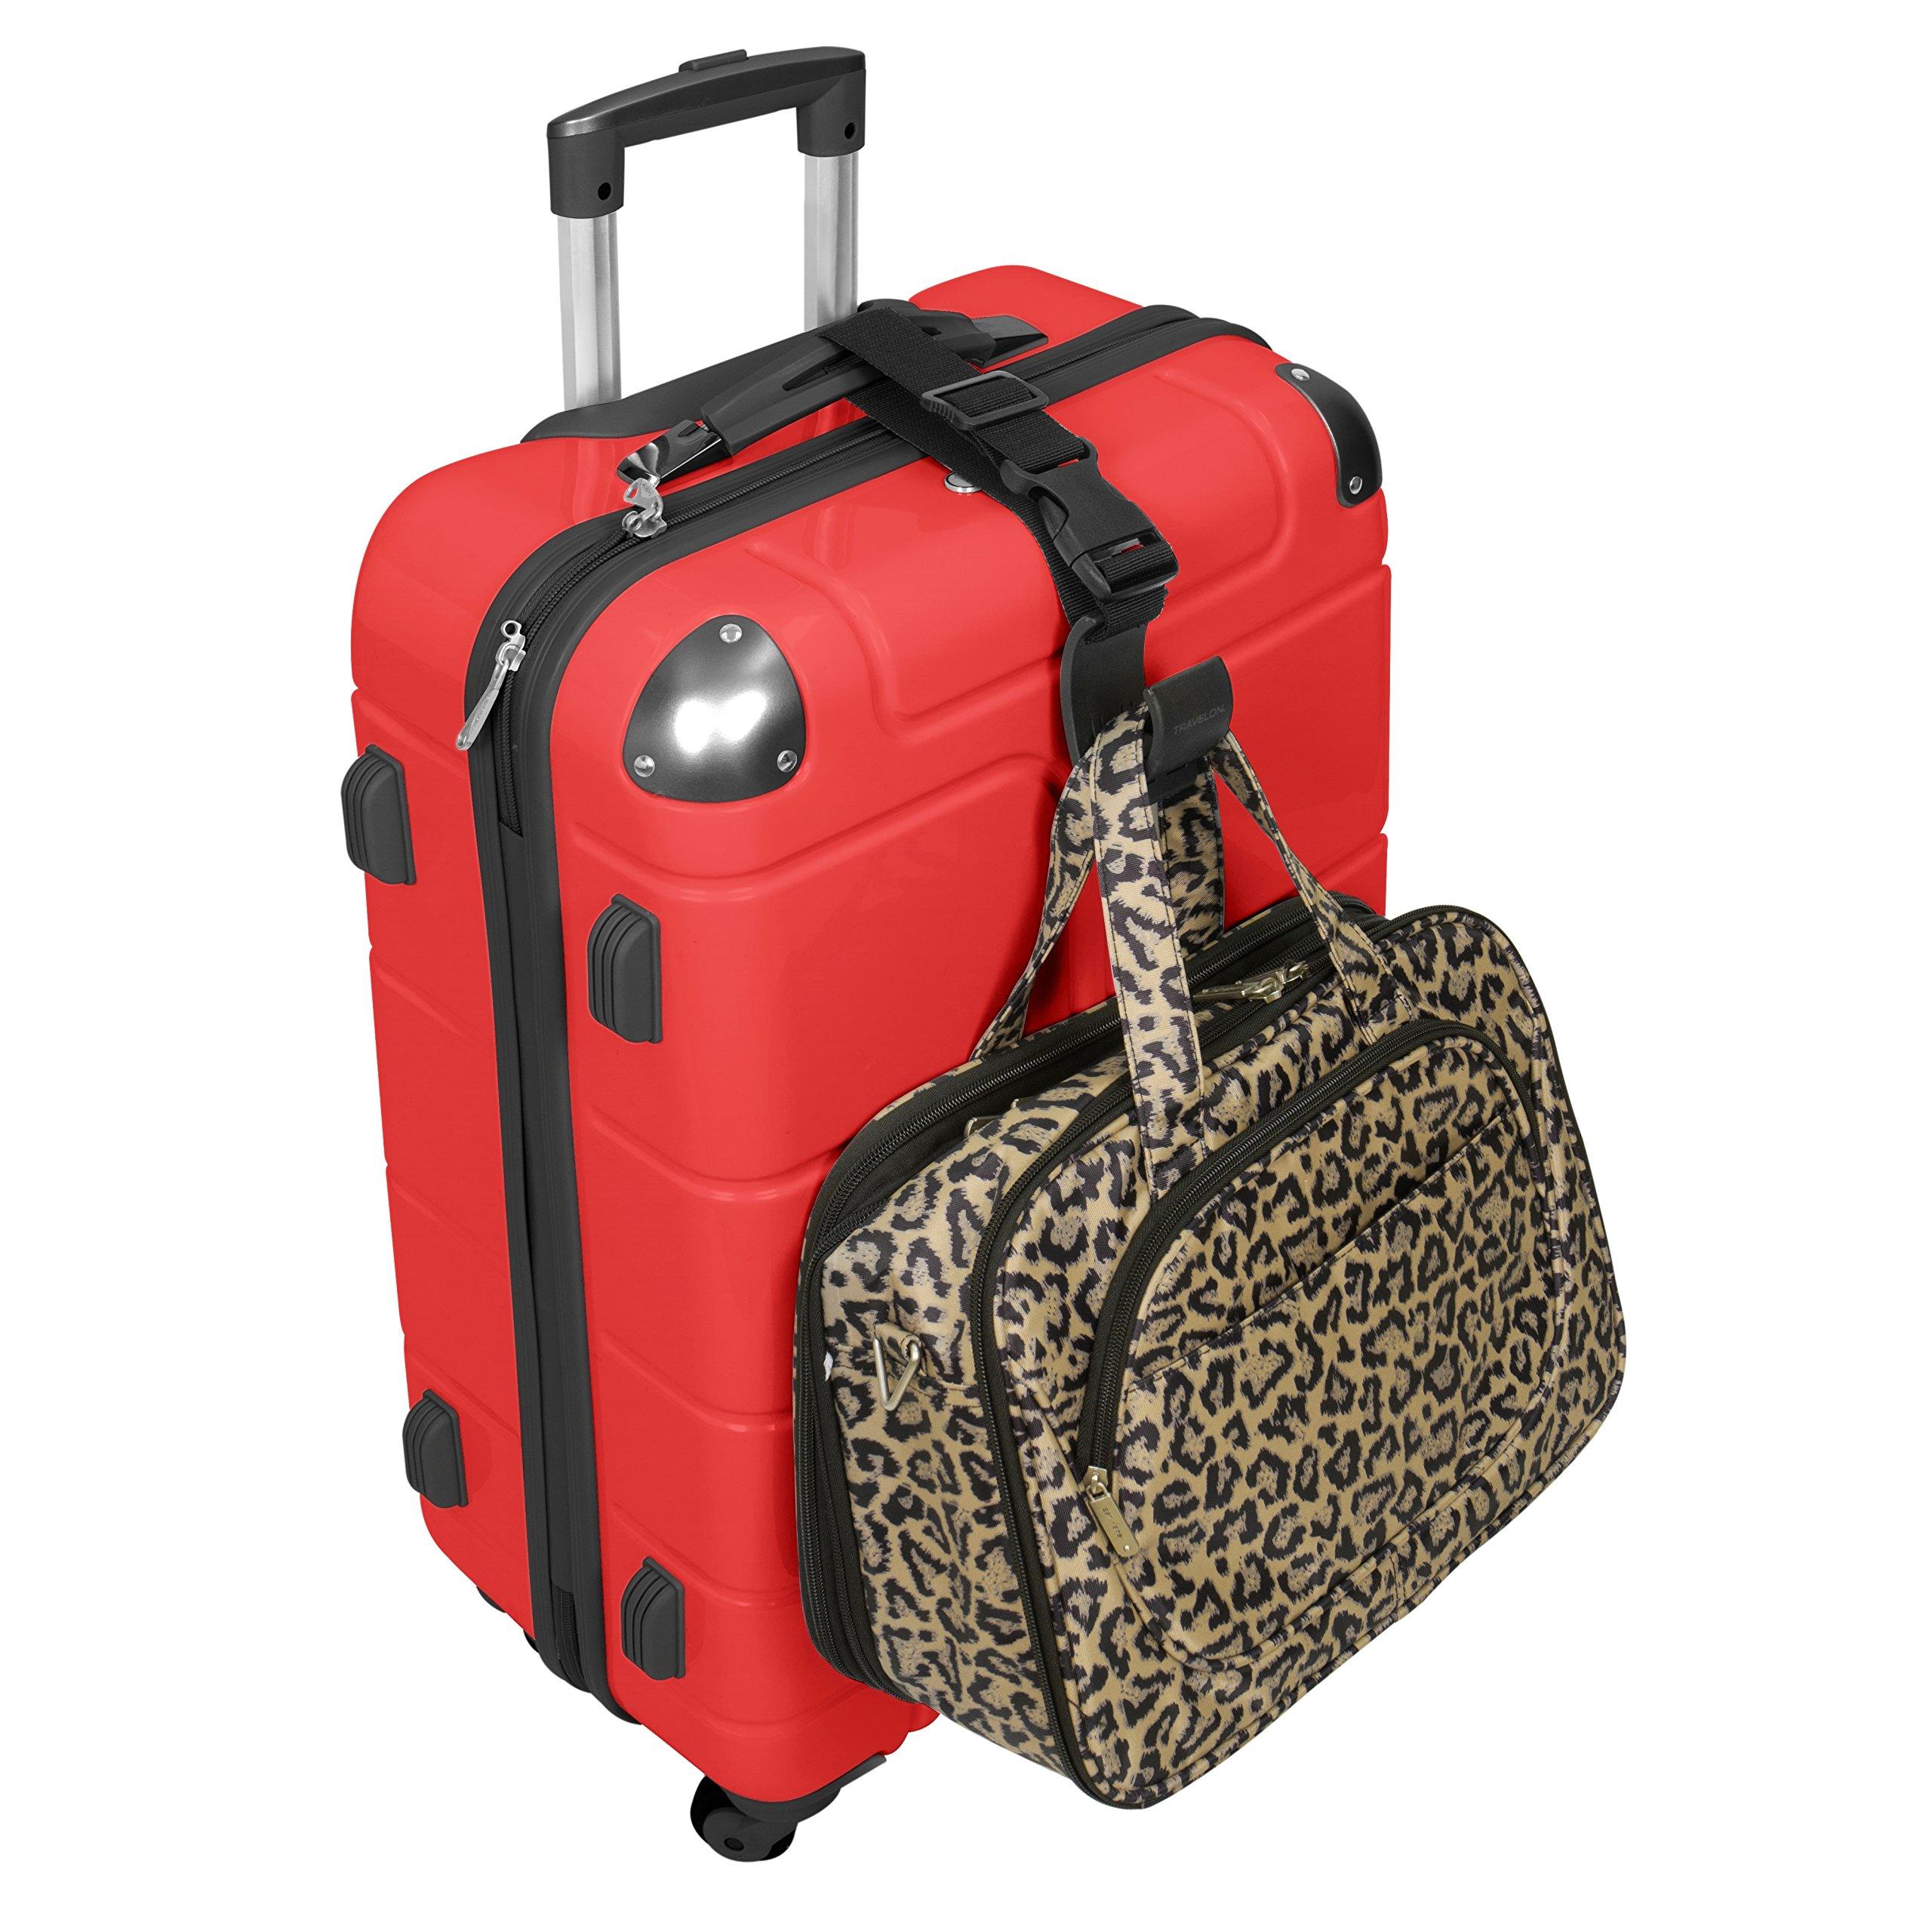 Travelon Add A Bag Strap, Black, One Size by Travelon (Image #2)